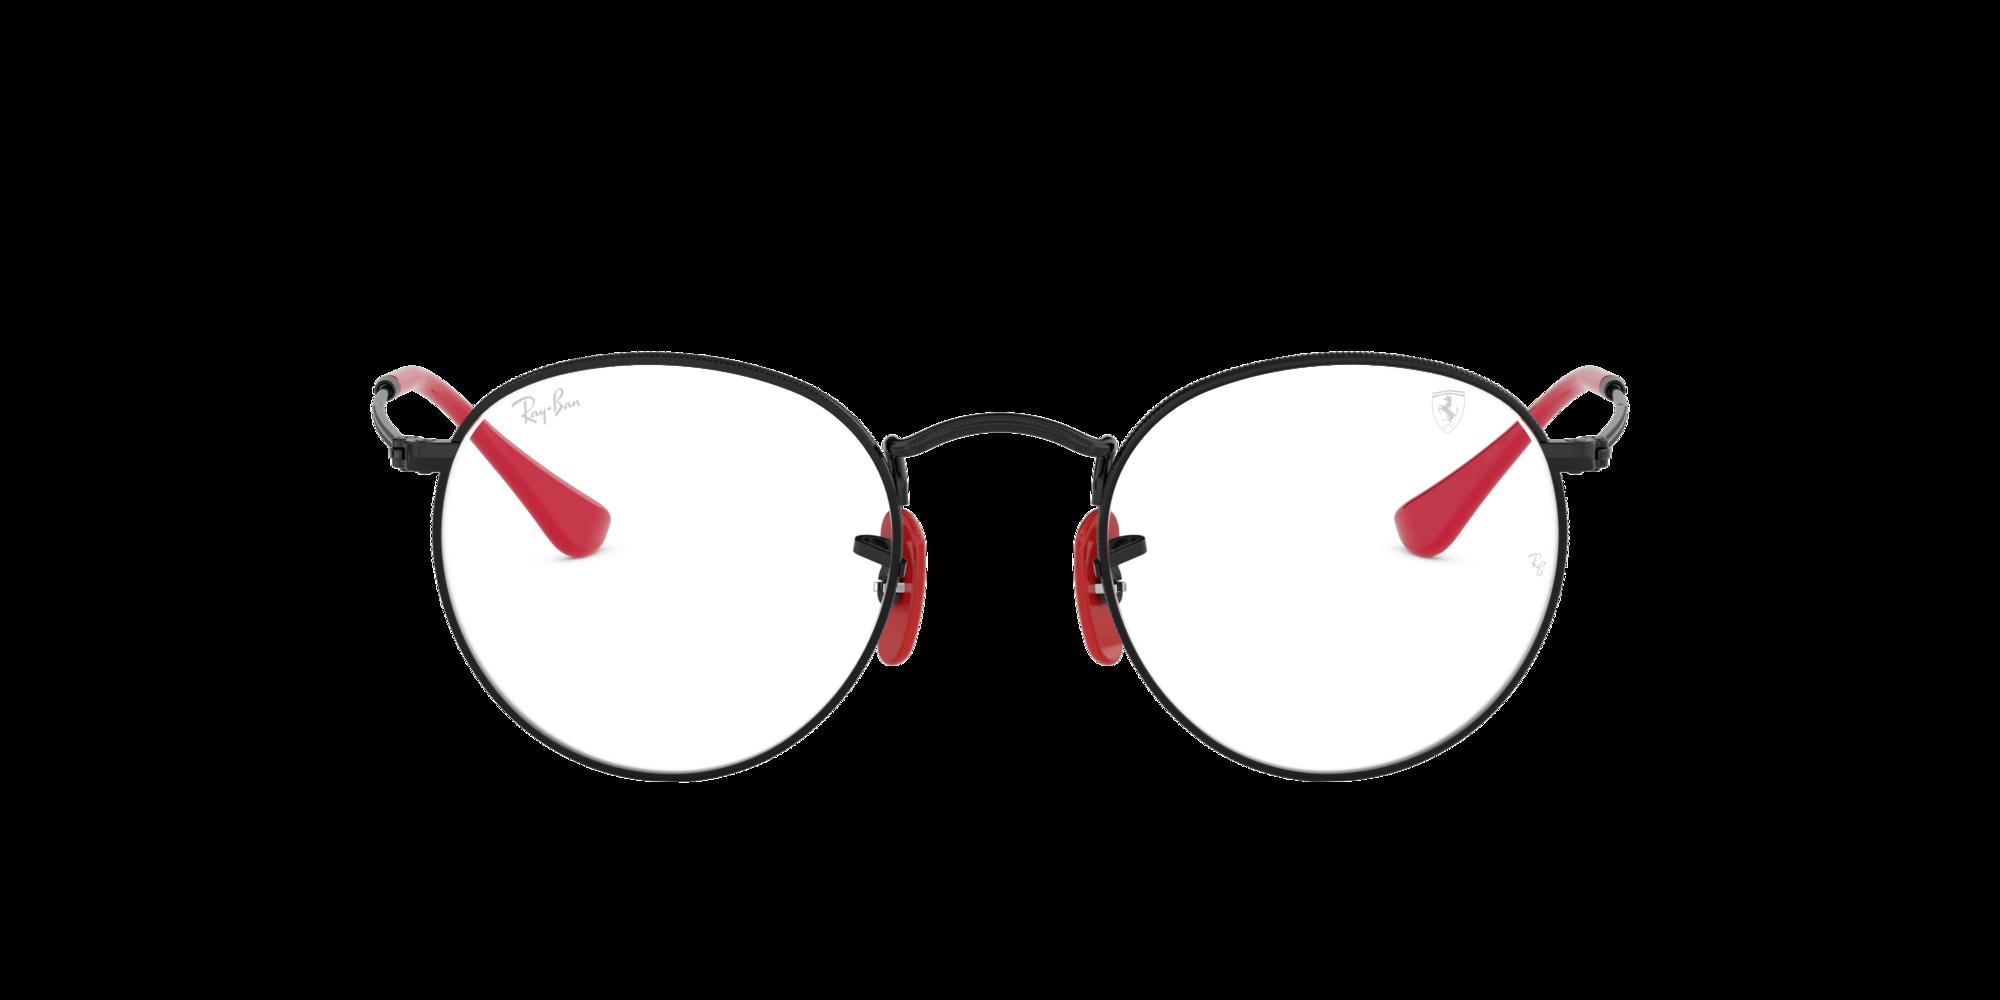 Image for RX3447VM FERRARI from LensCrafters | Glasses, Prescription Glasses Online, Eyewear